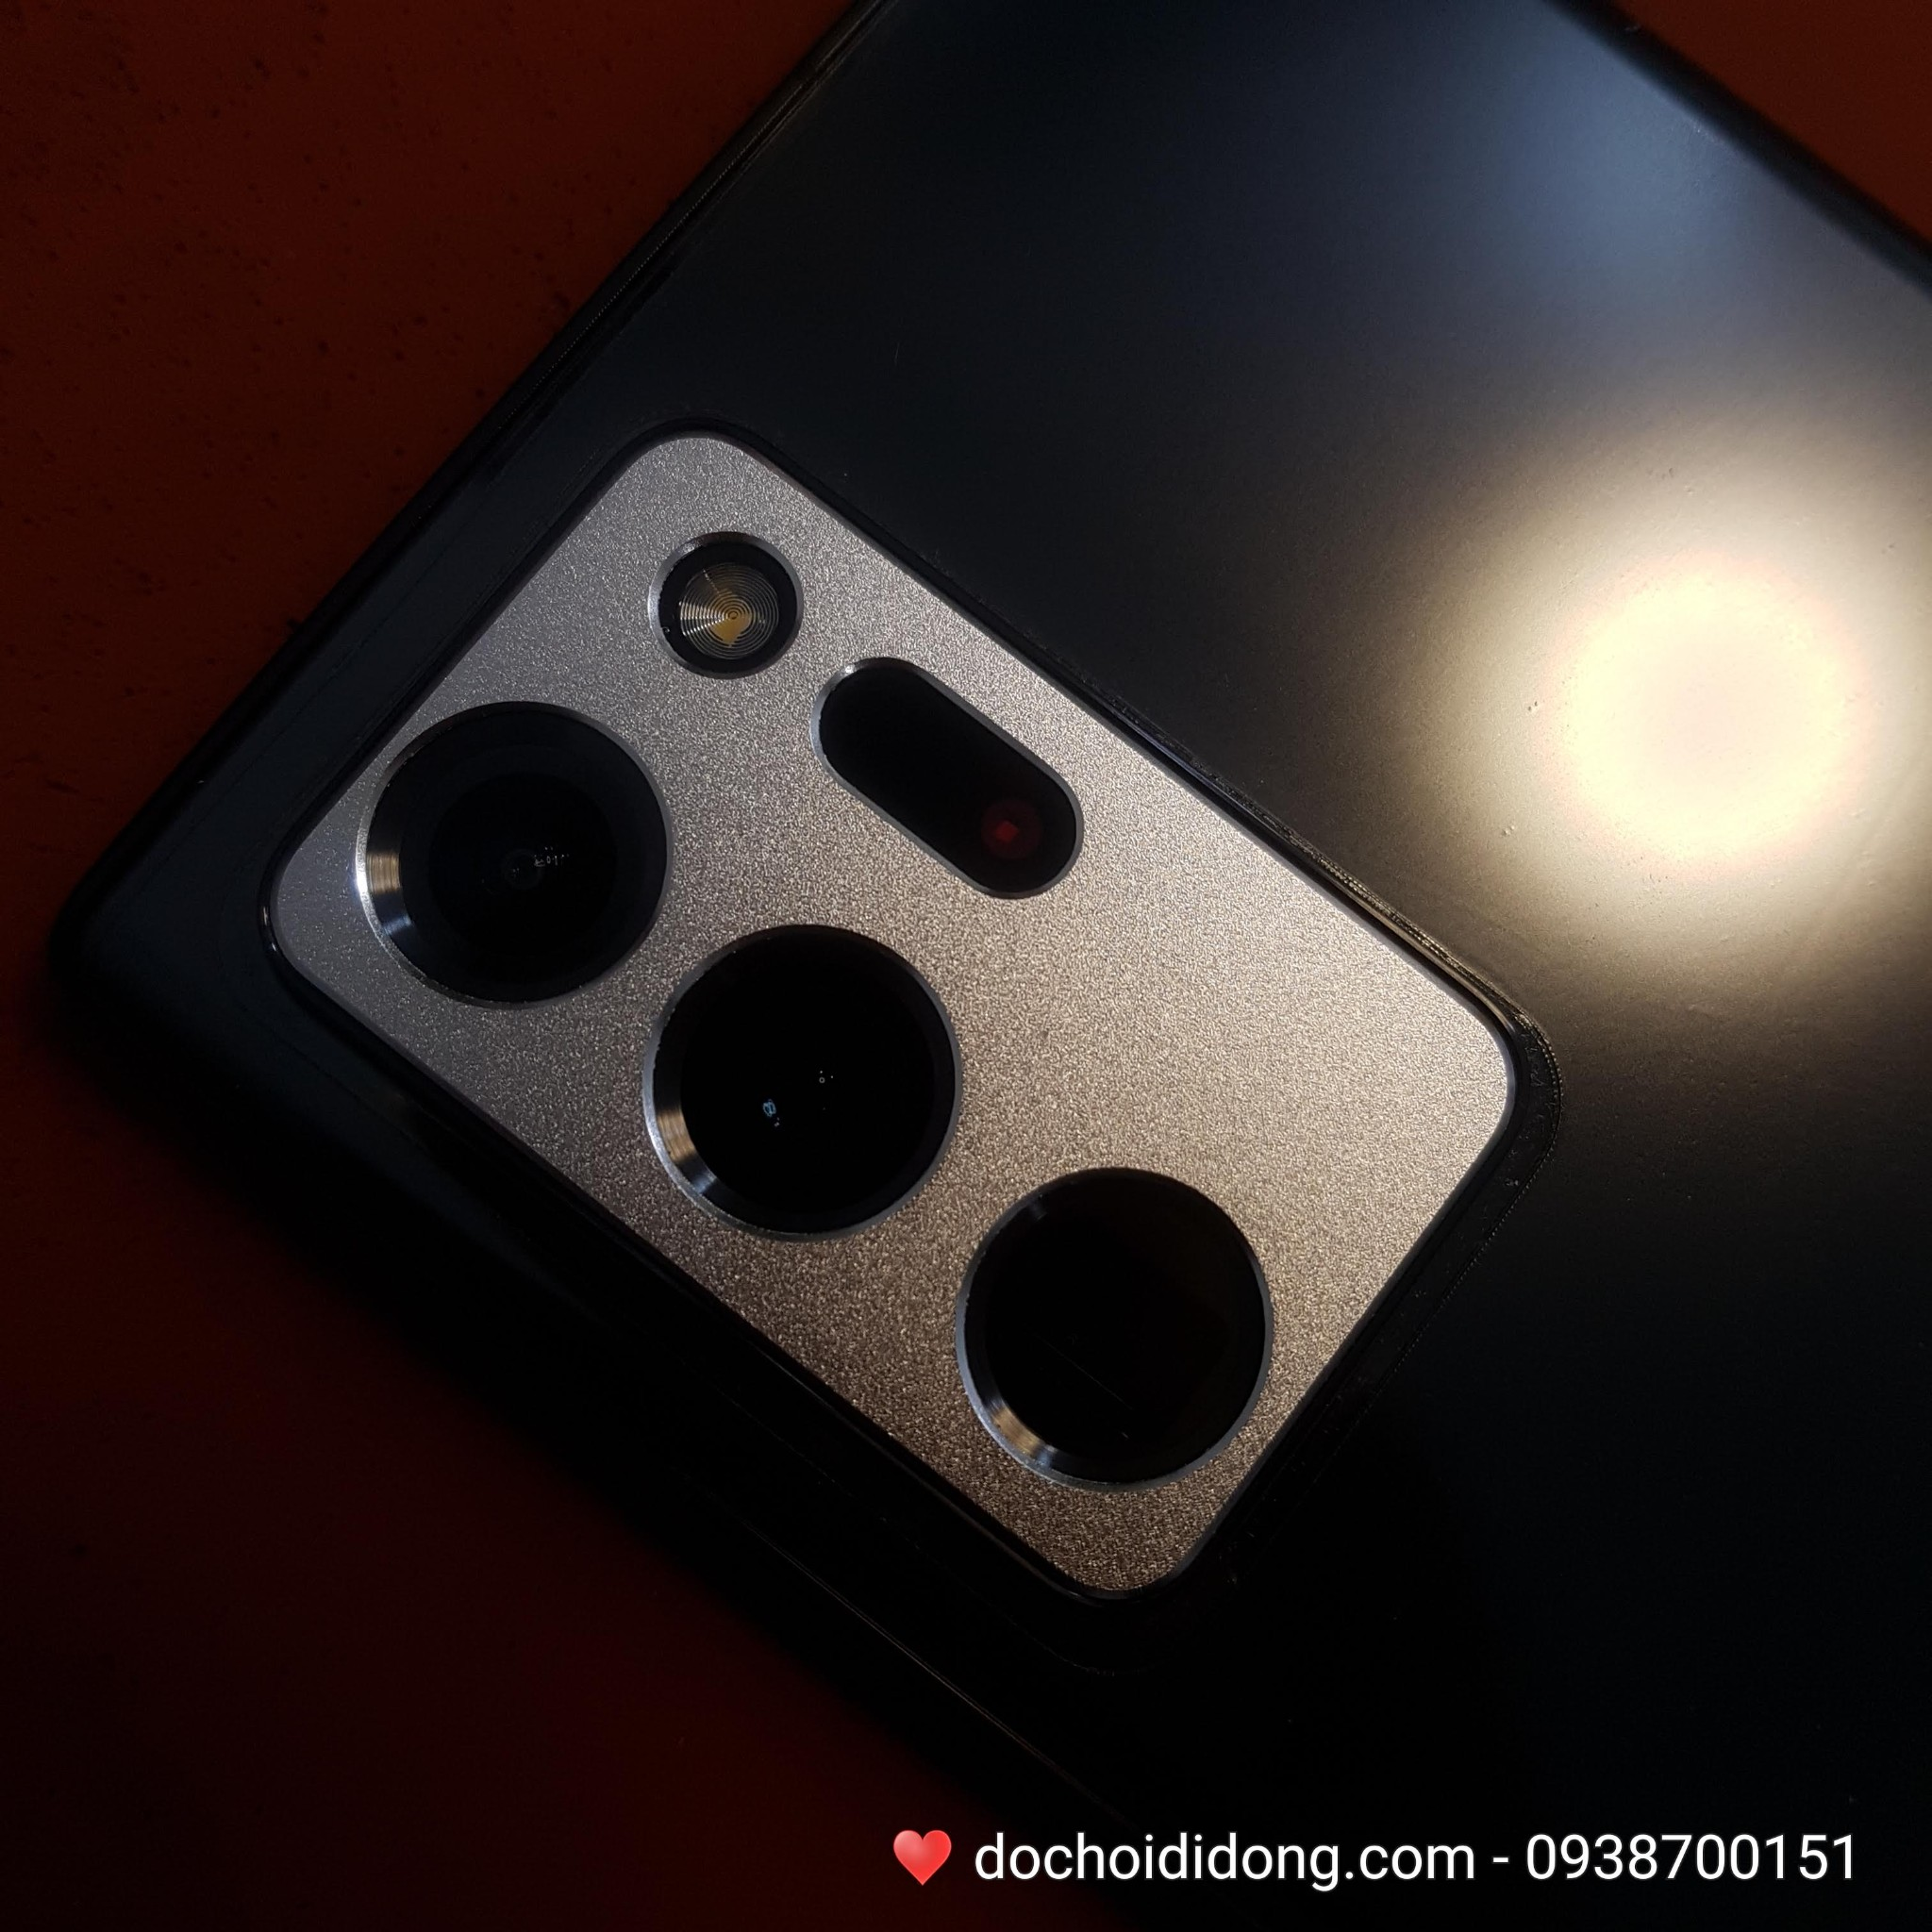 khung-nhom-bao-ve-camera-samsung-note-20-ultra